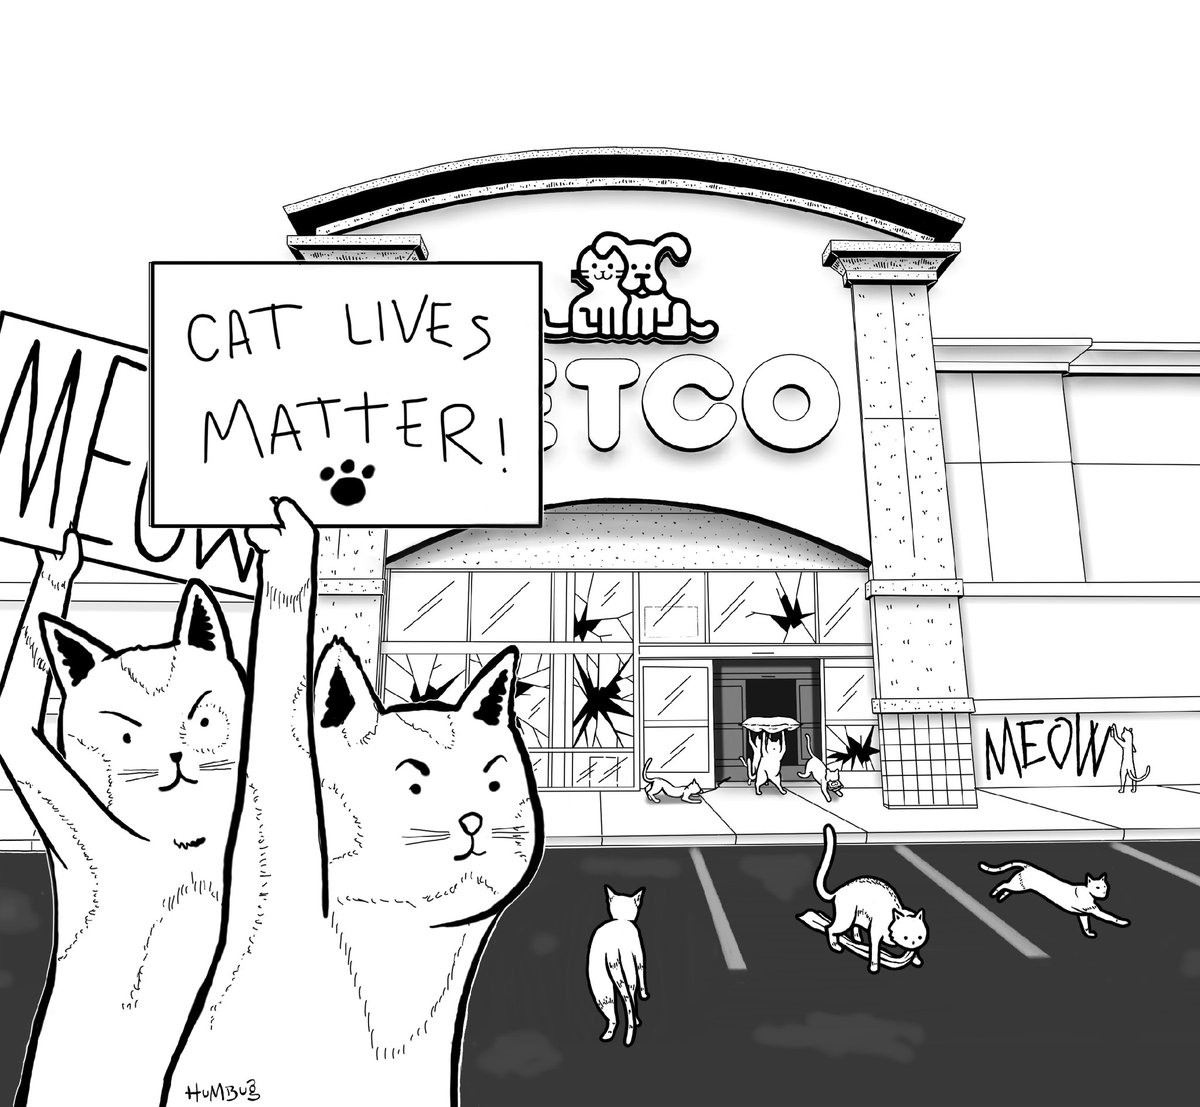 Cat Lives Matter #blm #BlackLivesMatter #catlivesmatter #riot #kitties #politicalart #ArtistOnTwitter https://t.co/6TE6y40owg